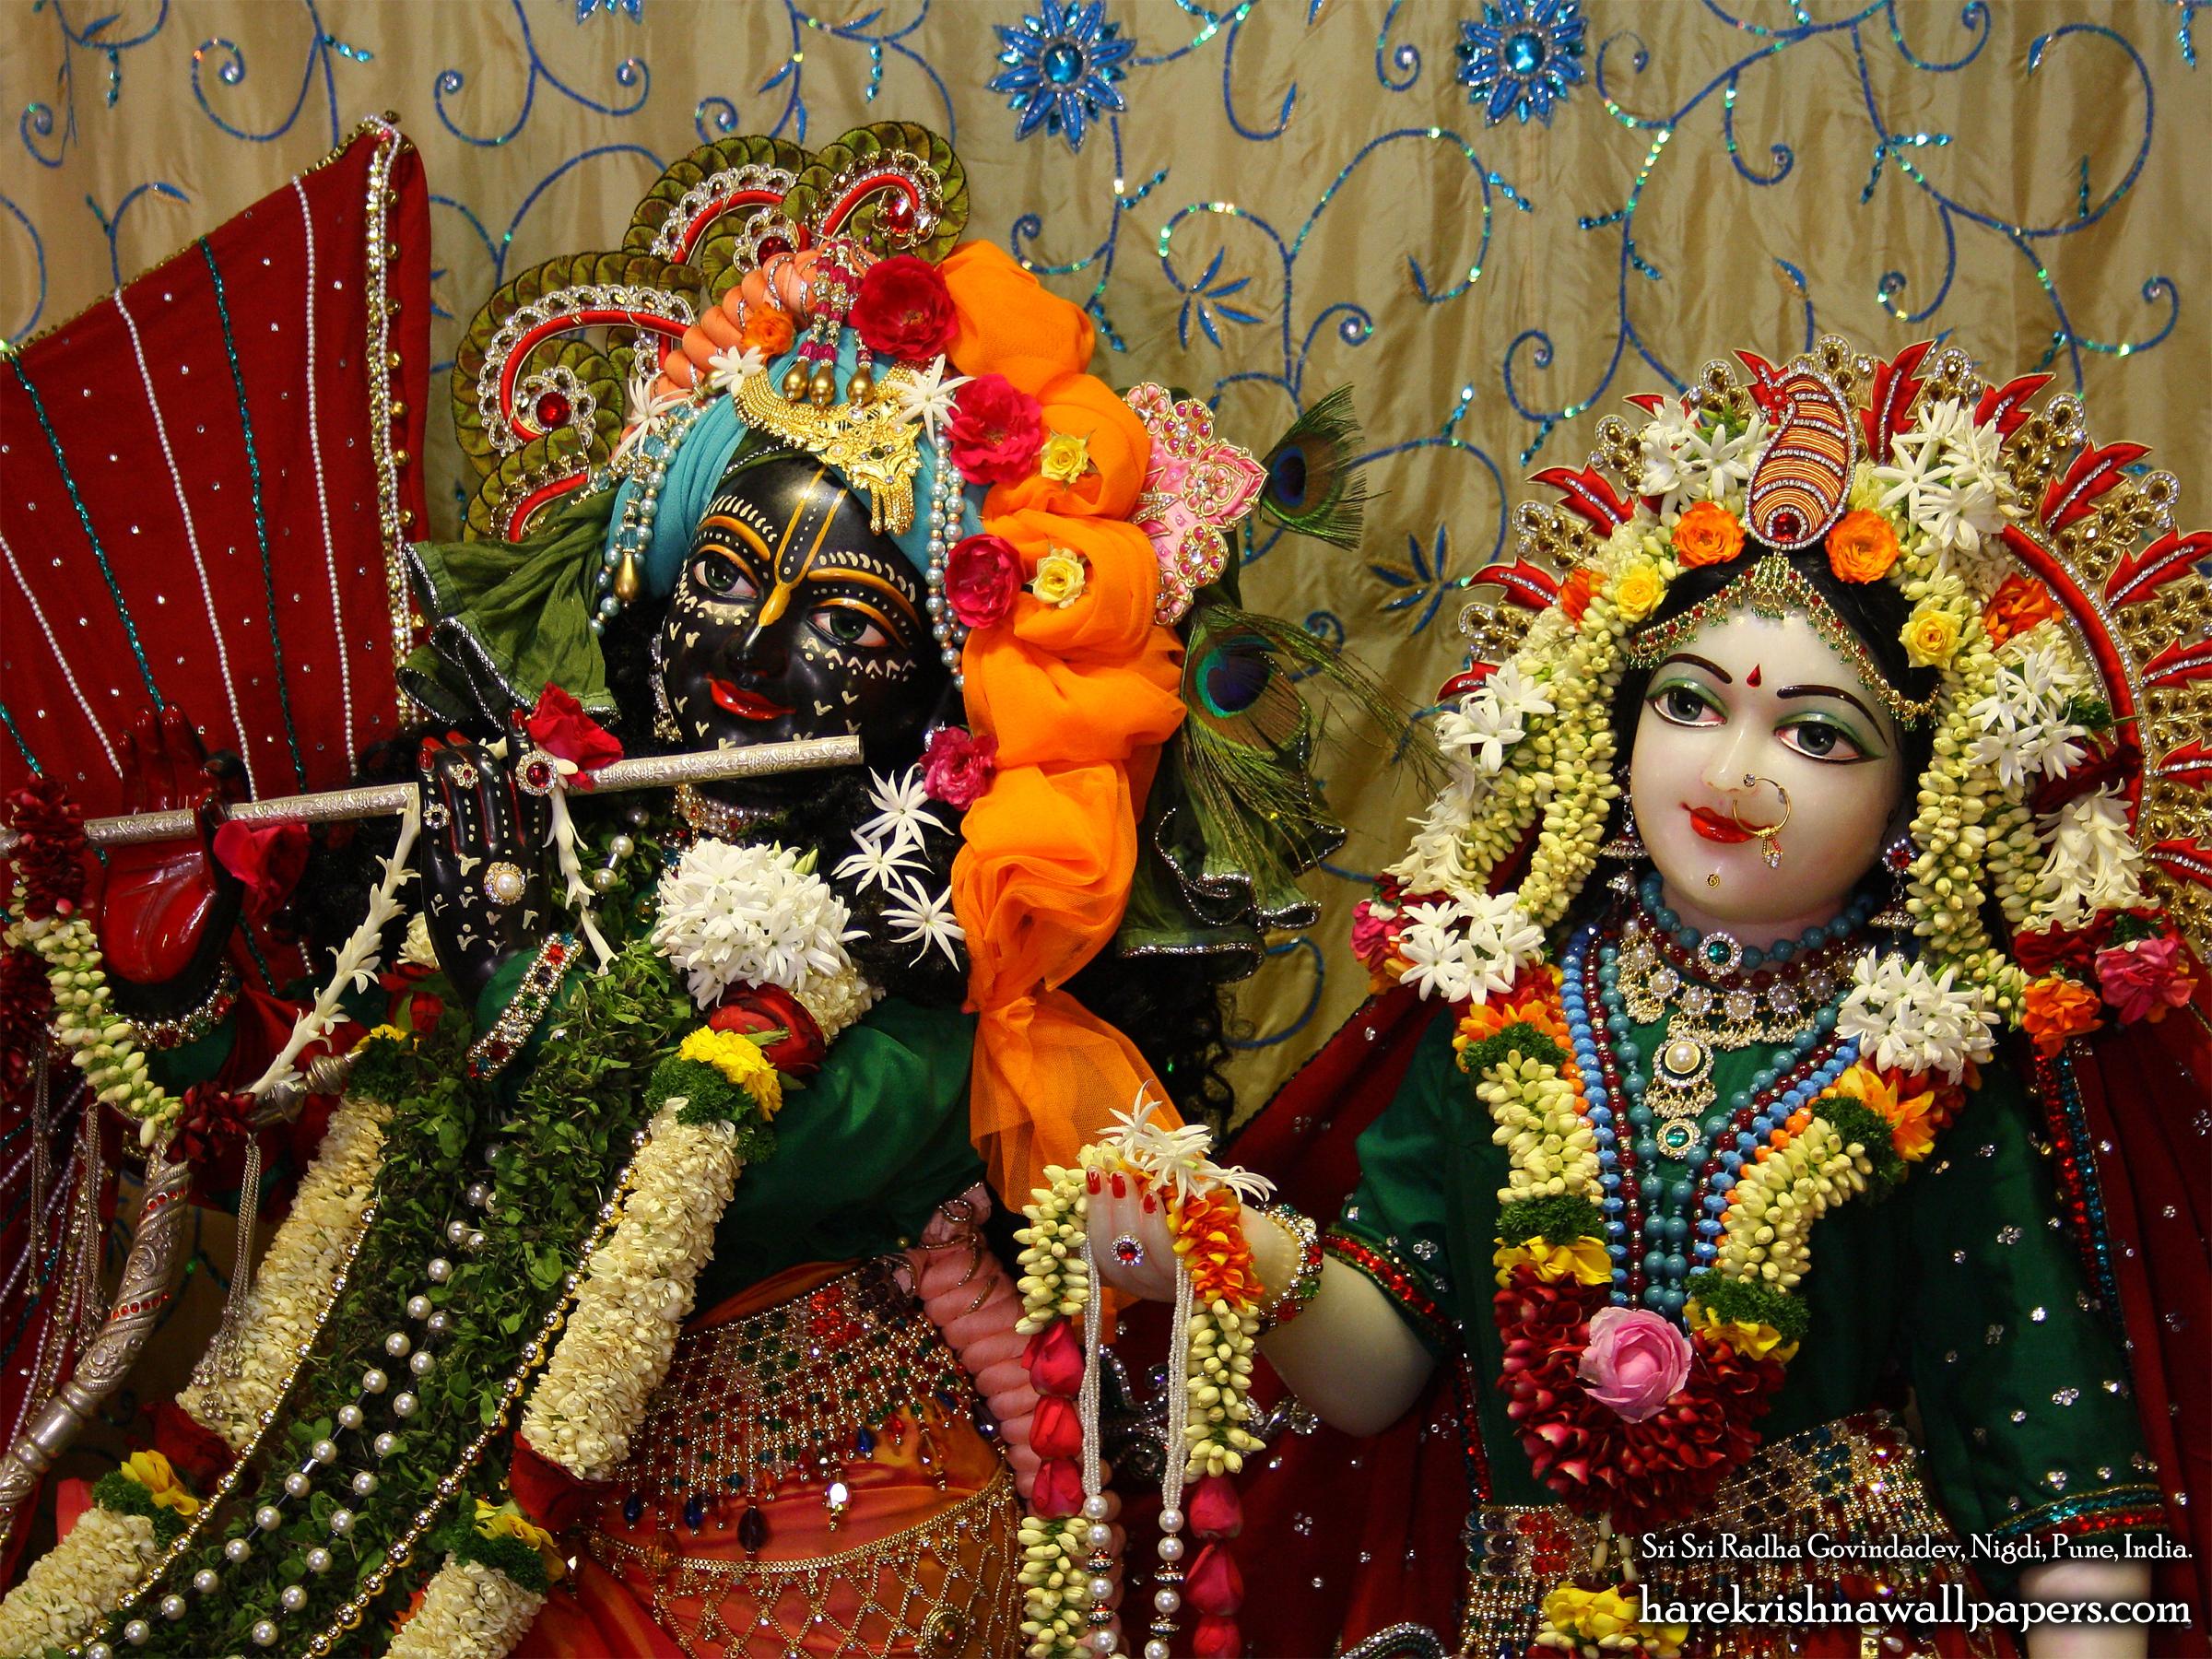 Sri Sri Radha Govind Close up Wallpaper (005) Size 2400x1800 Download